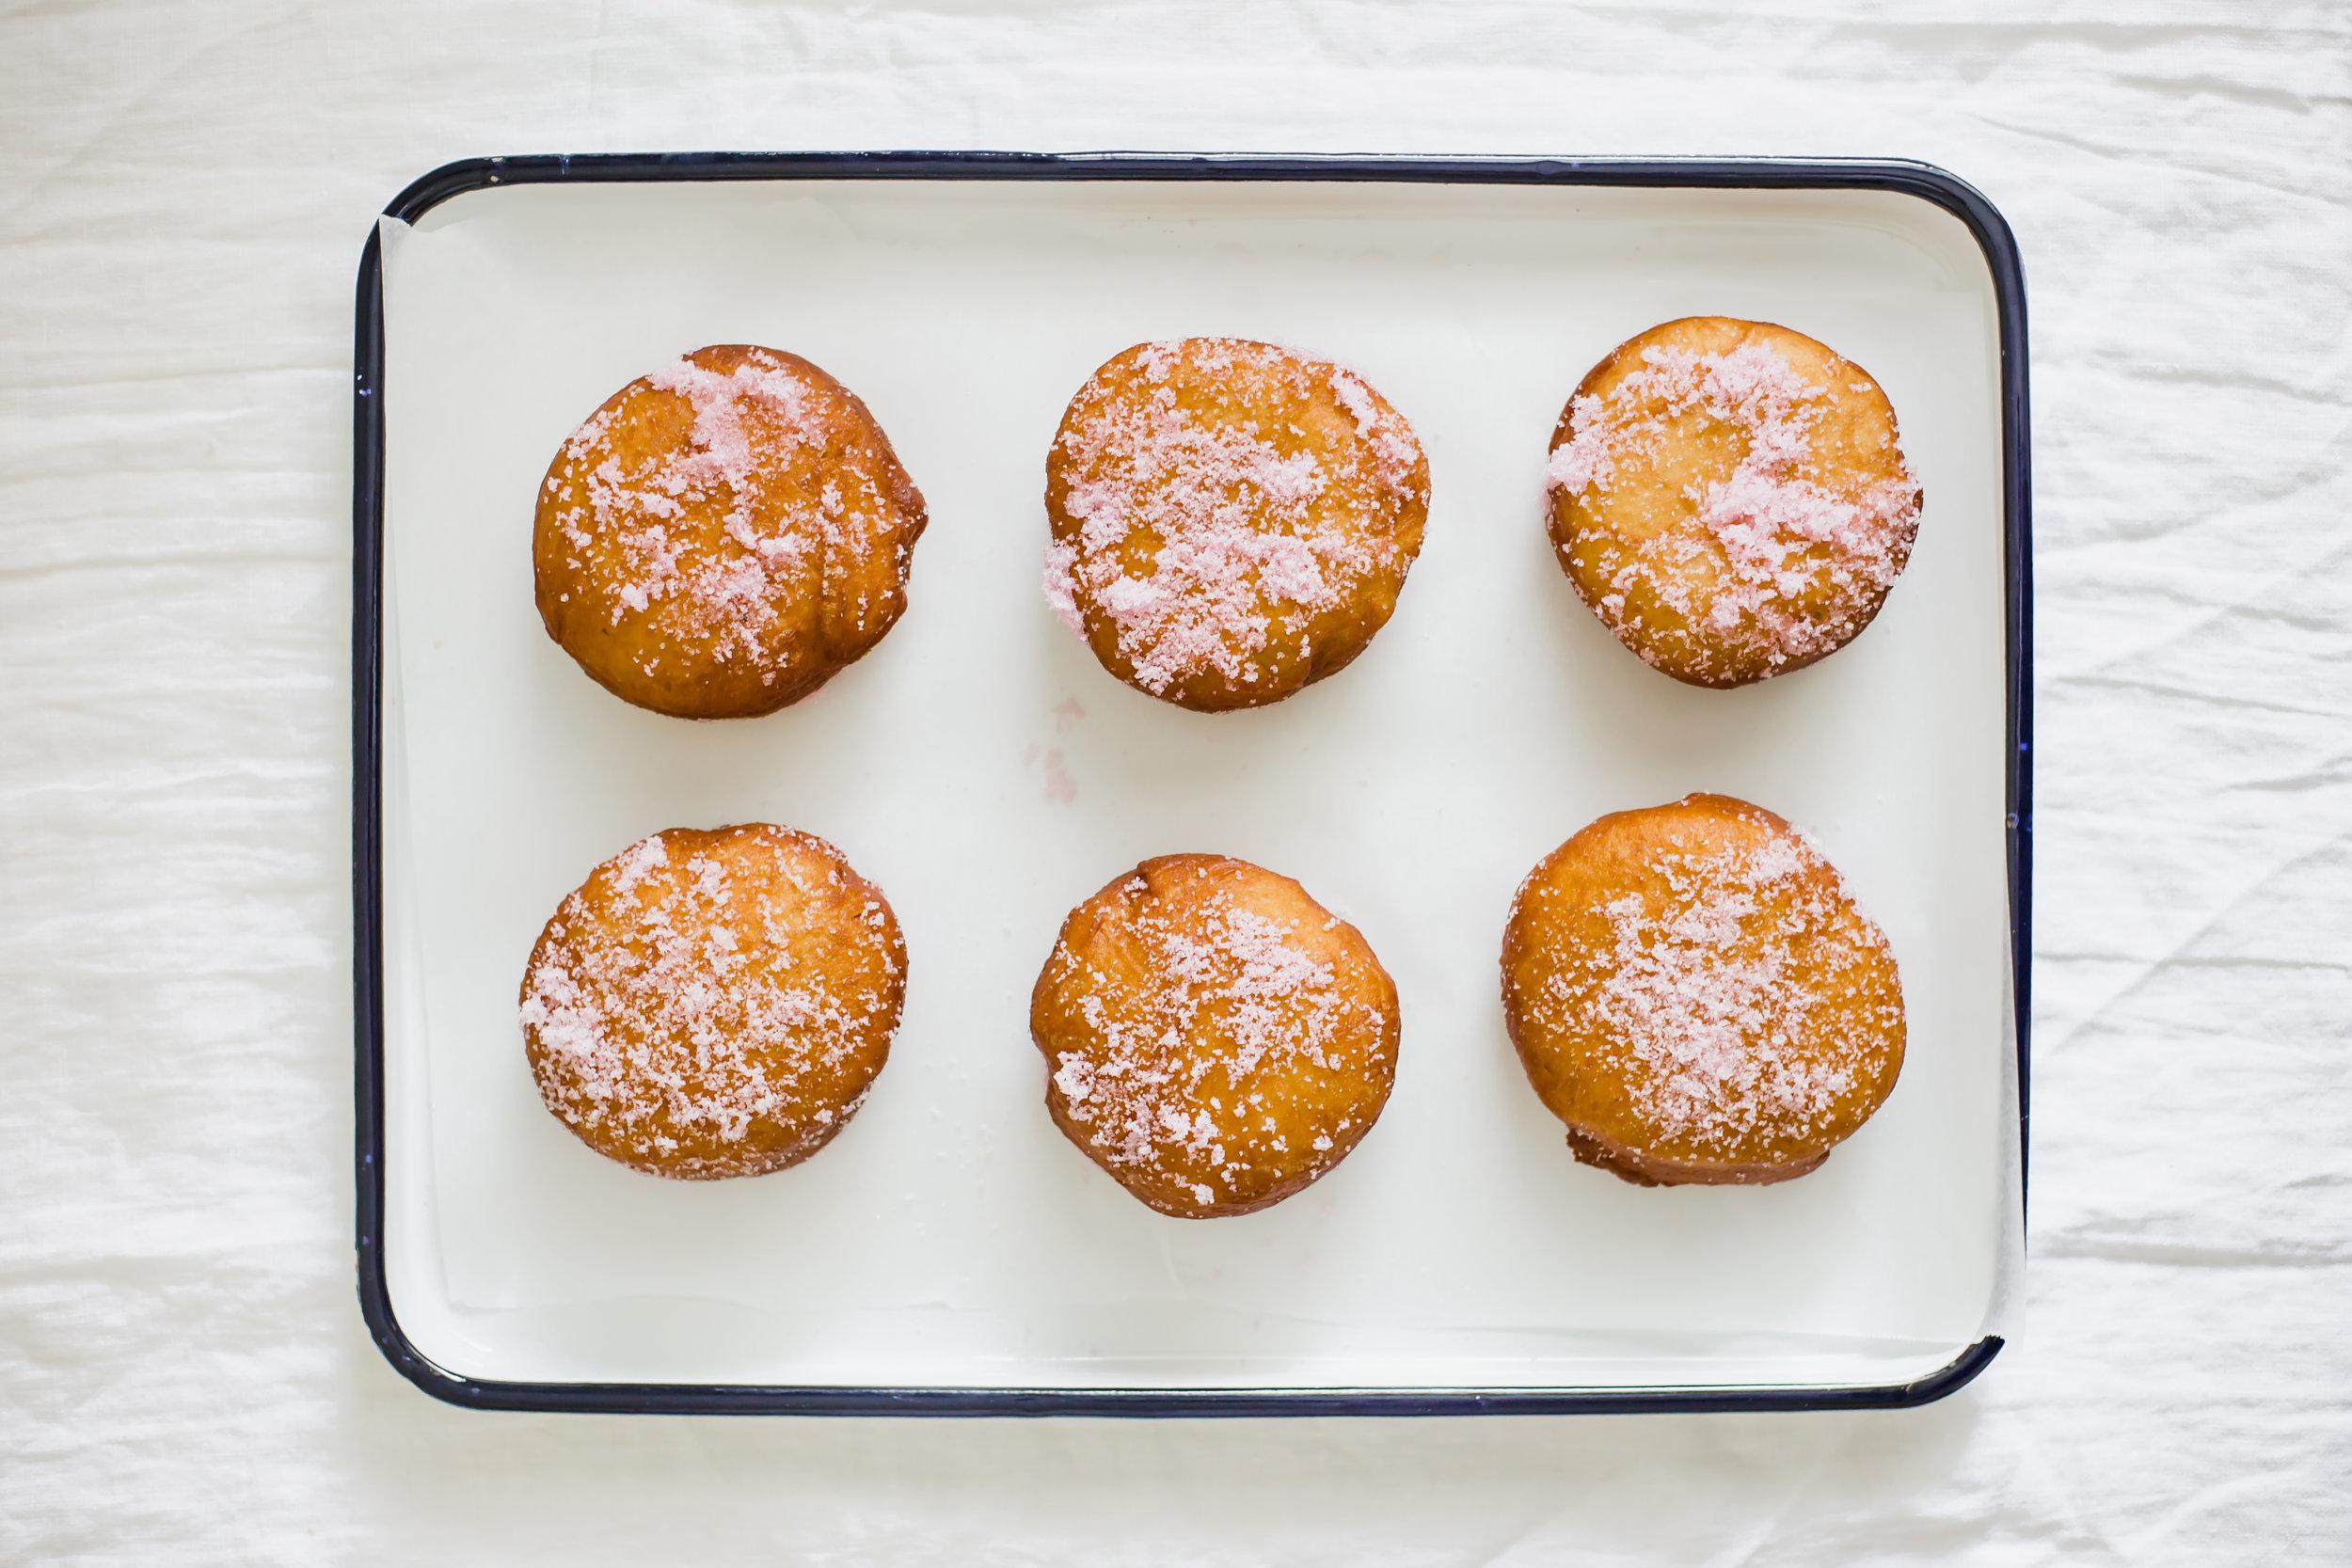 Pomegranate Cream Doughnuts | Madeline Marie Hall